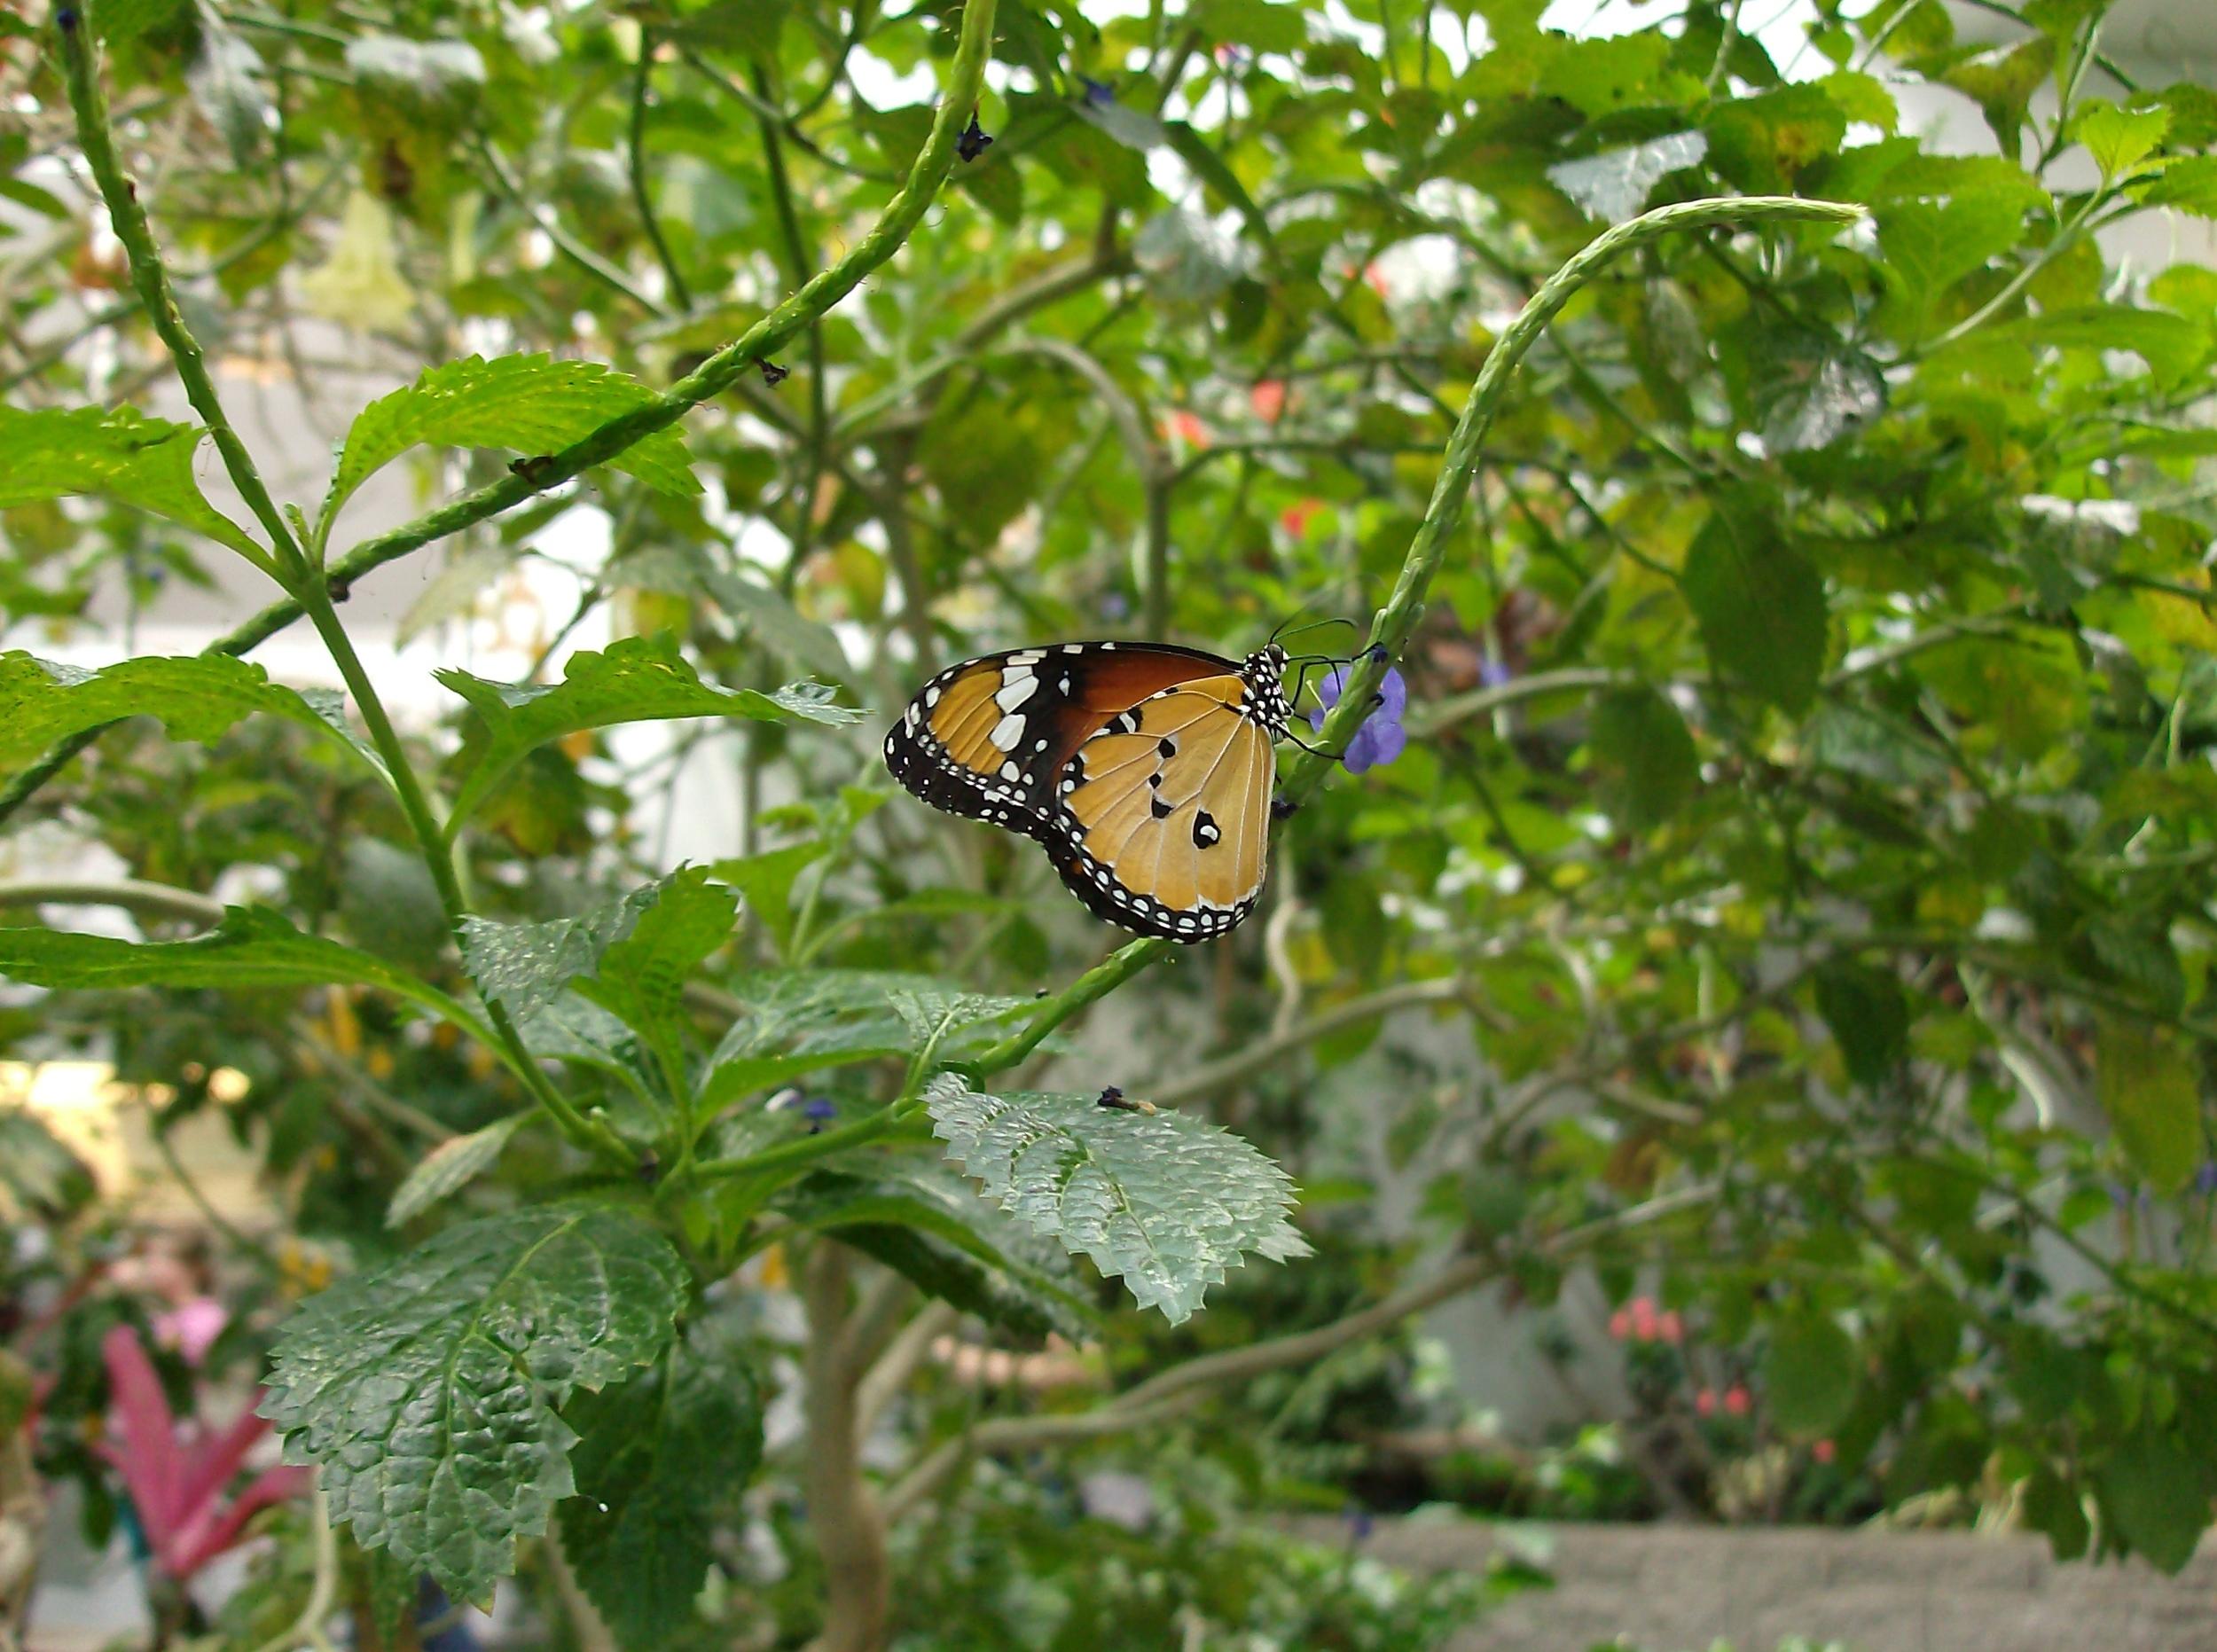 butterfly_hpim1348.jpg